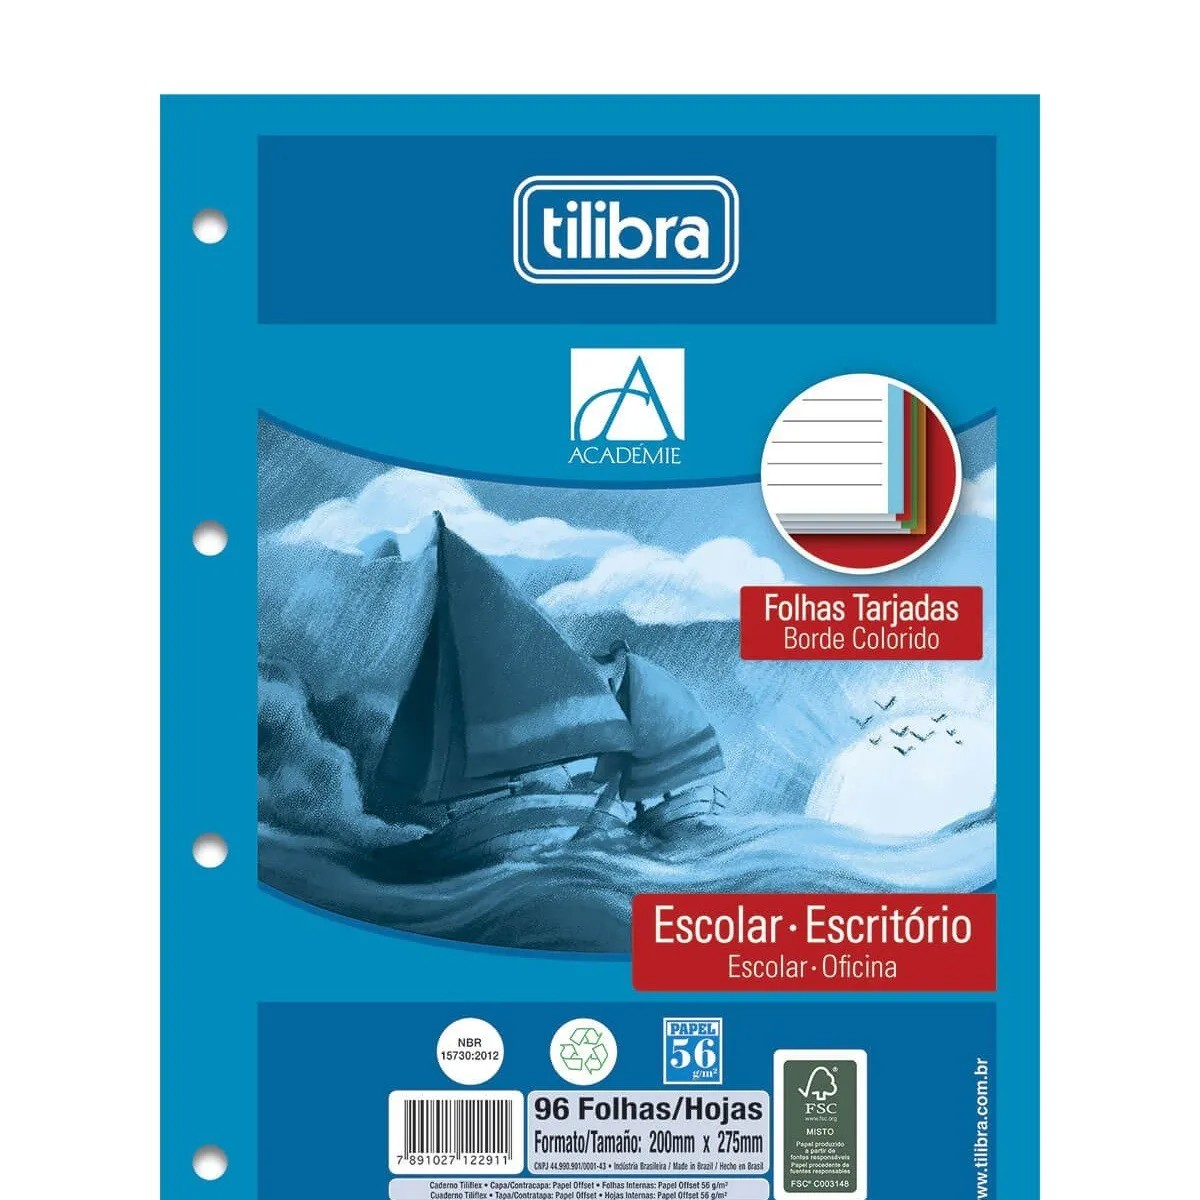 Refil Fichário Tiliflex Academie Borda Colorida 96 Fls (Pct c/ 5 unid) Tilibra